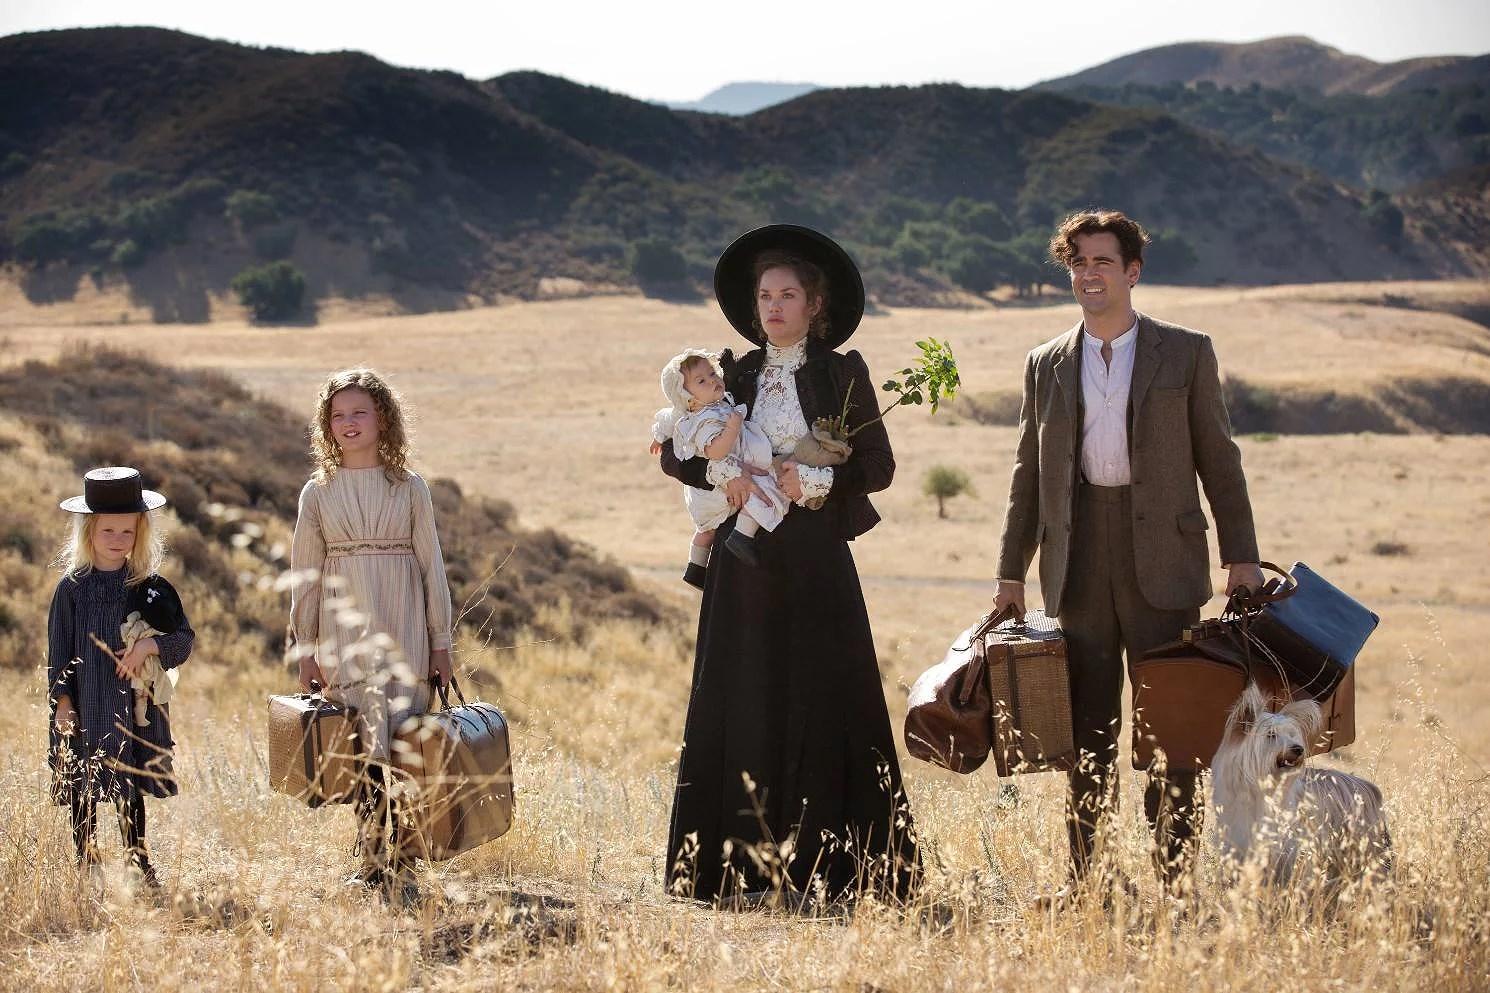 Mary Poppins/Saving mr Banks